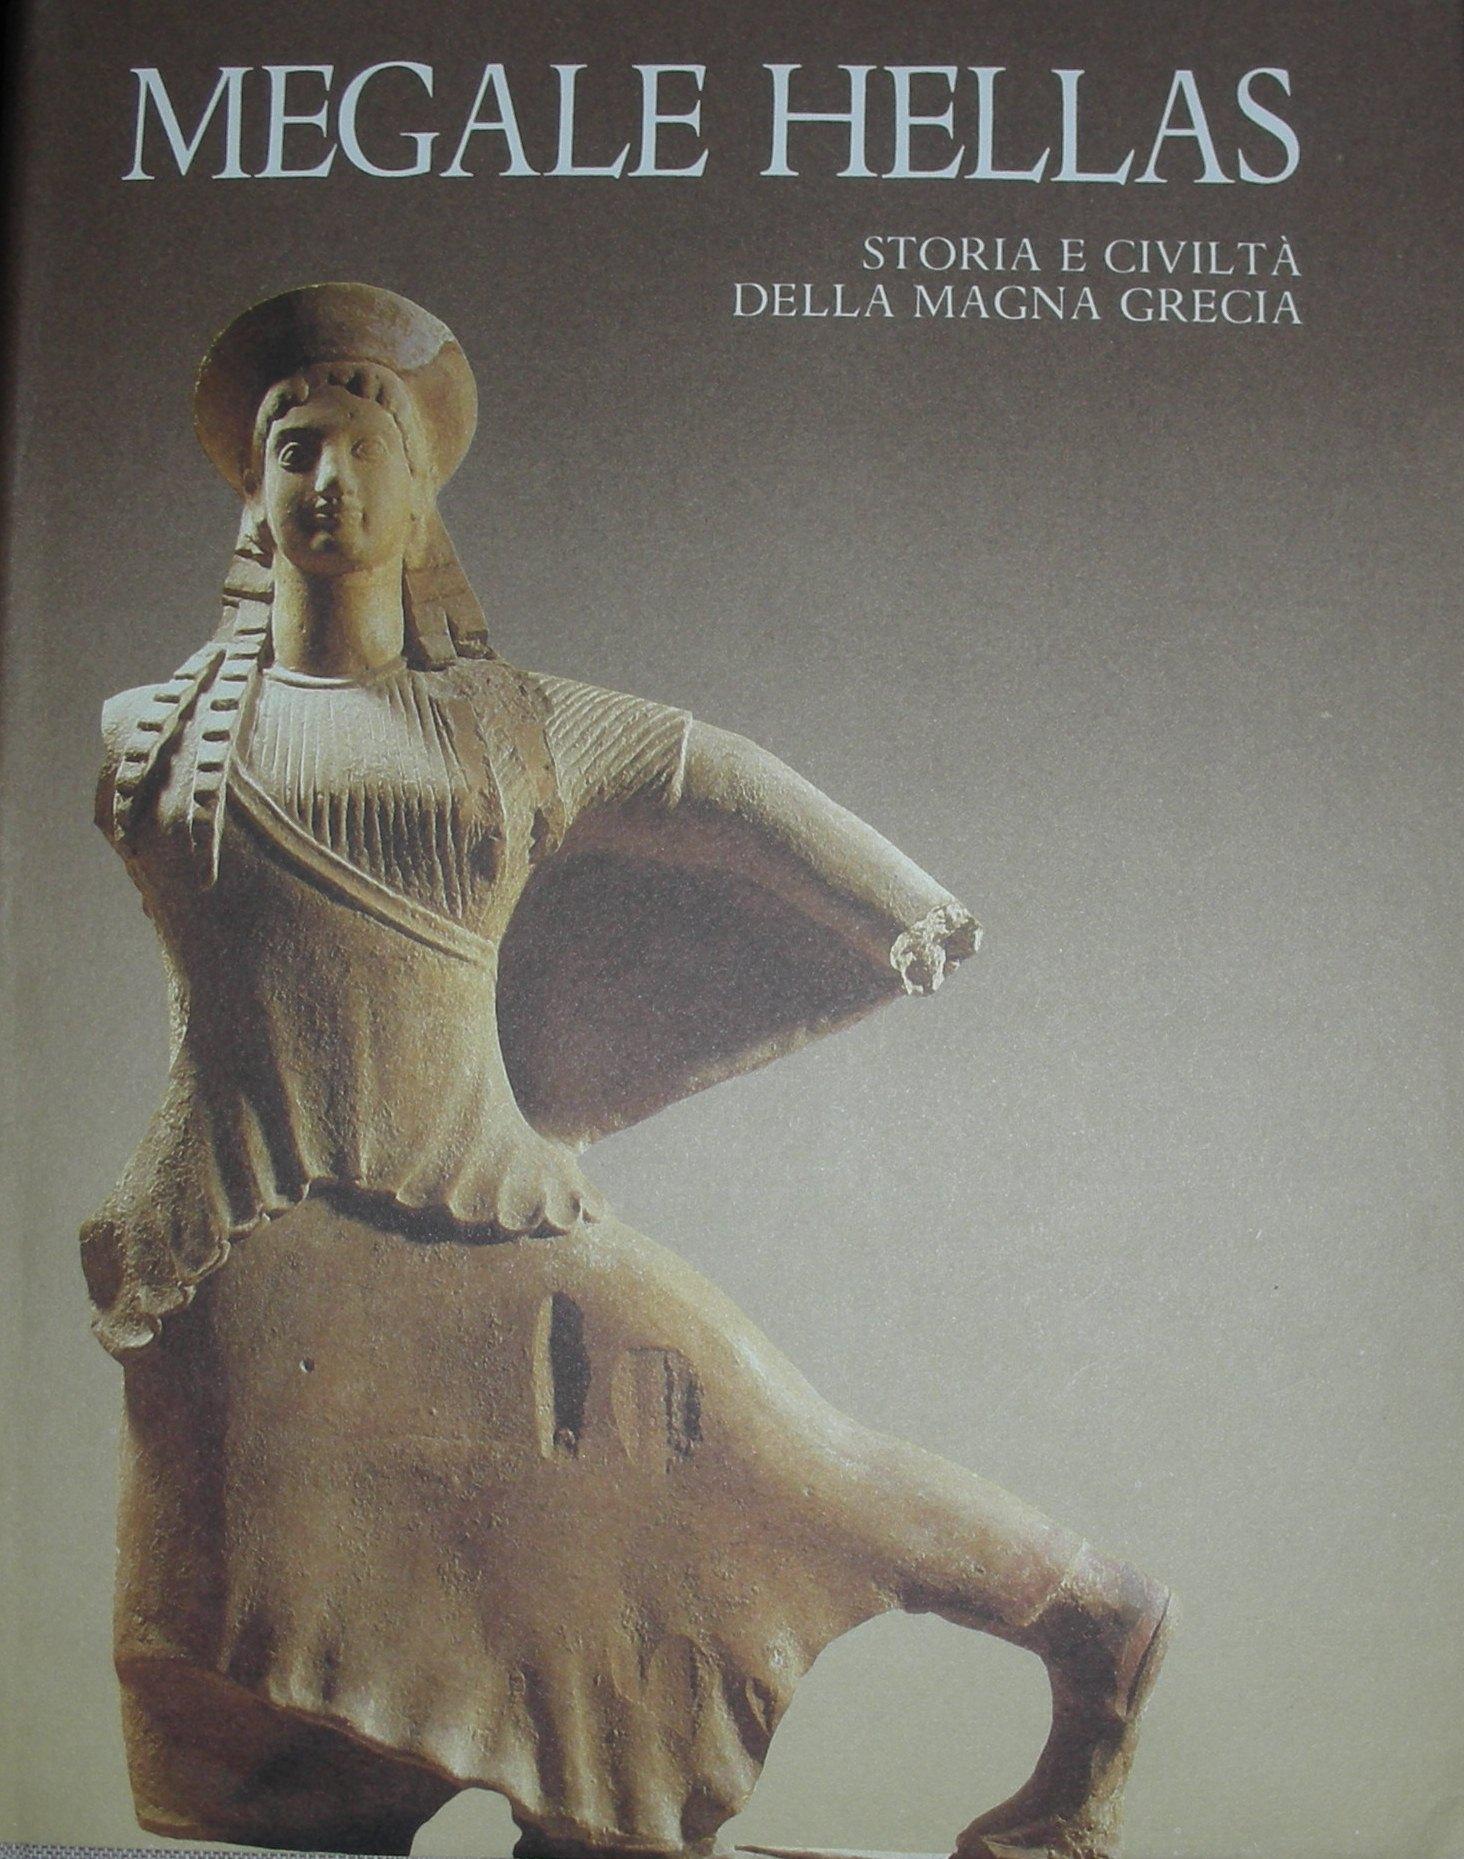 Megale Hellas